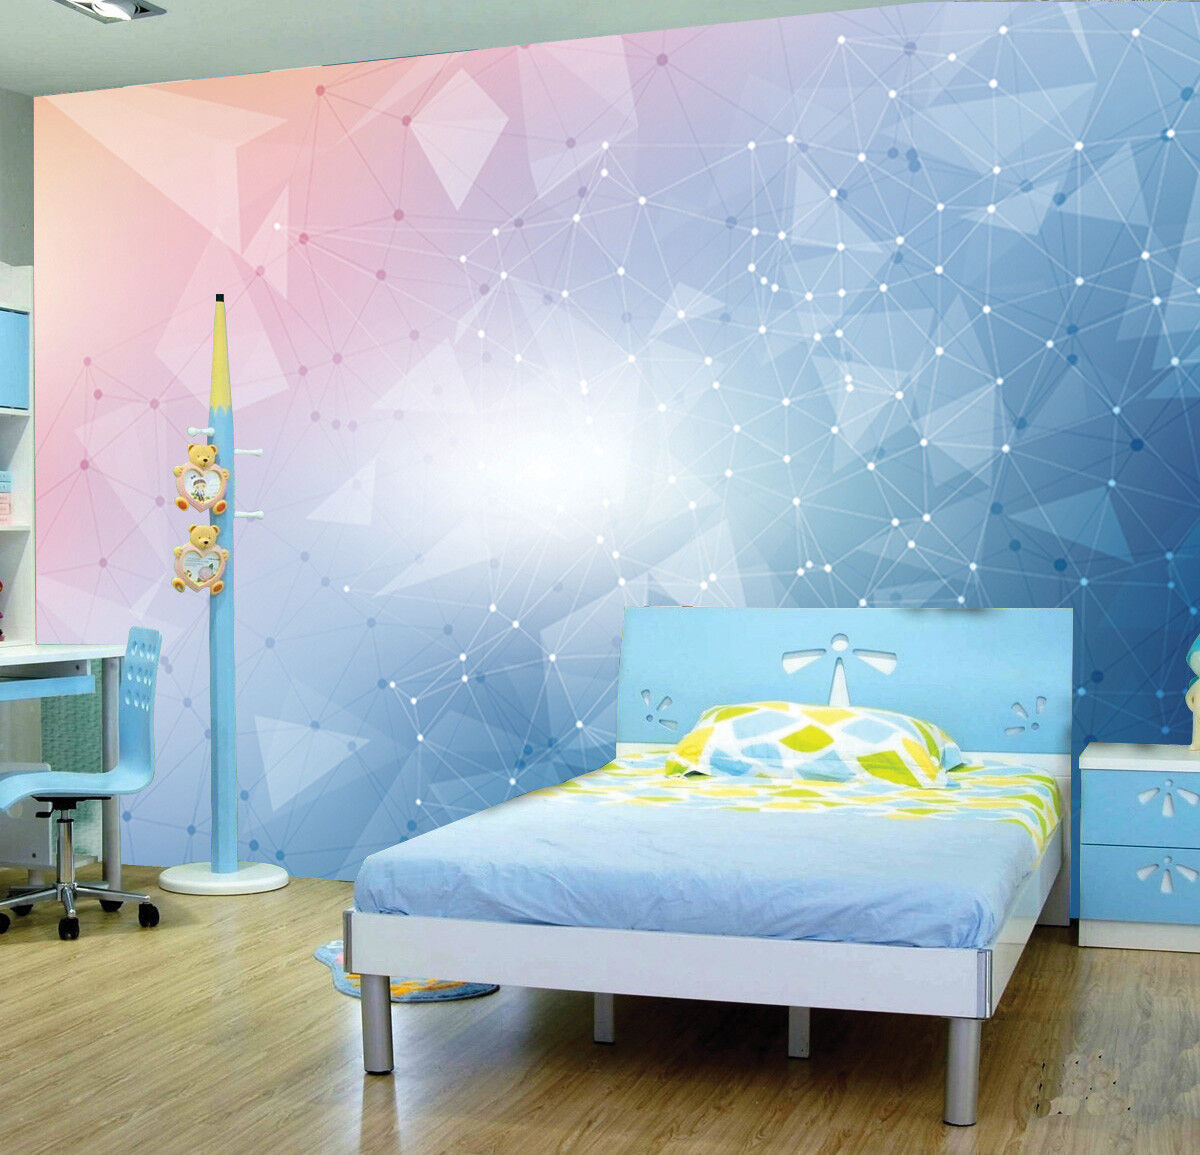 Details about Pink Blue Patel Colour Geometric Wallpaper Photo Mural Kids  Bedroom Home deco